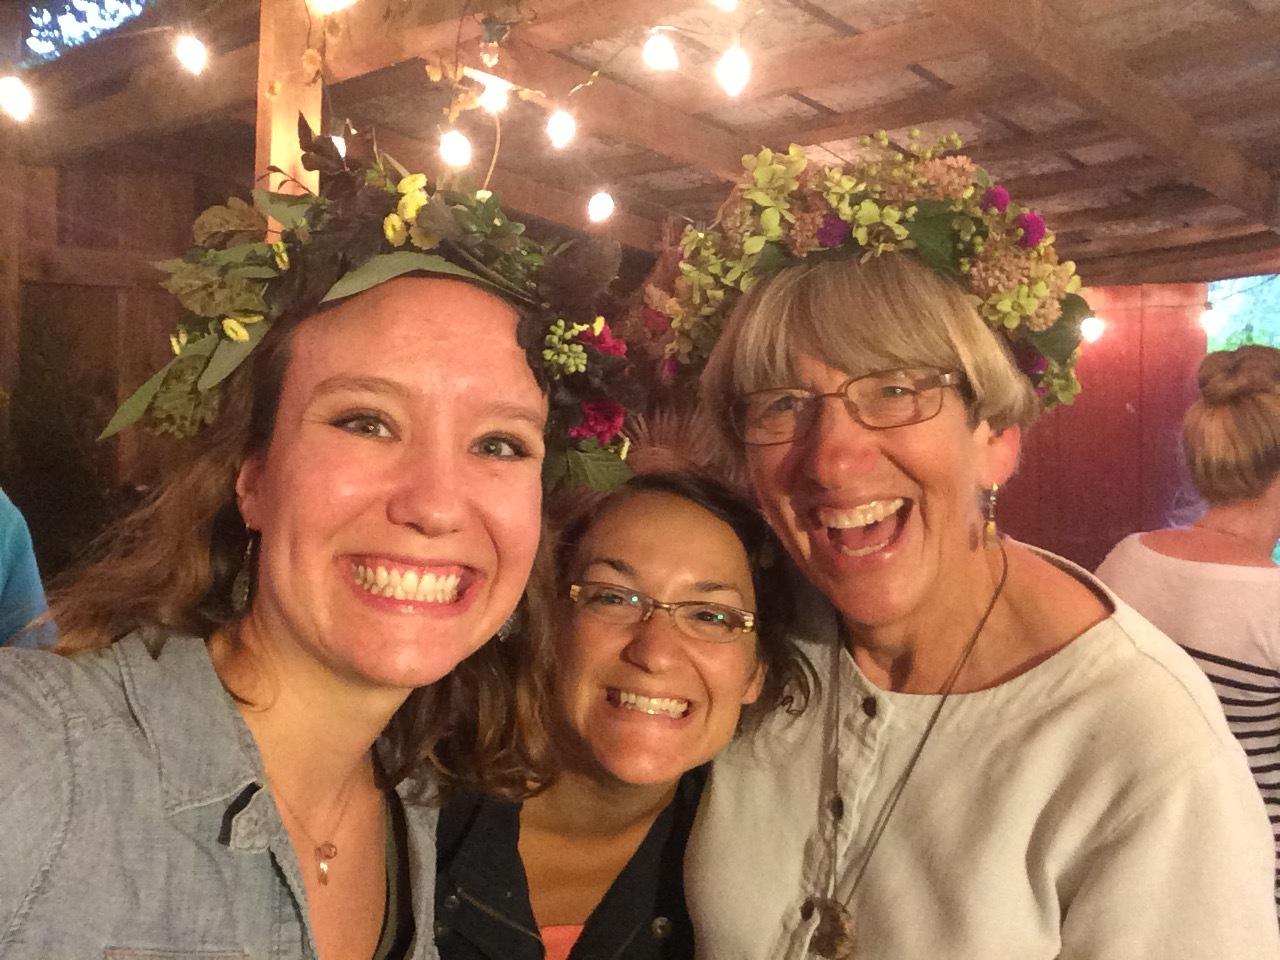 Rockin' flower crown practice with some flower friends at  Aunt Willie's Wildflowers !